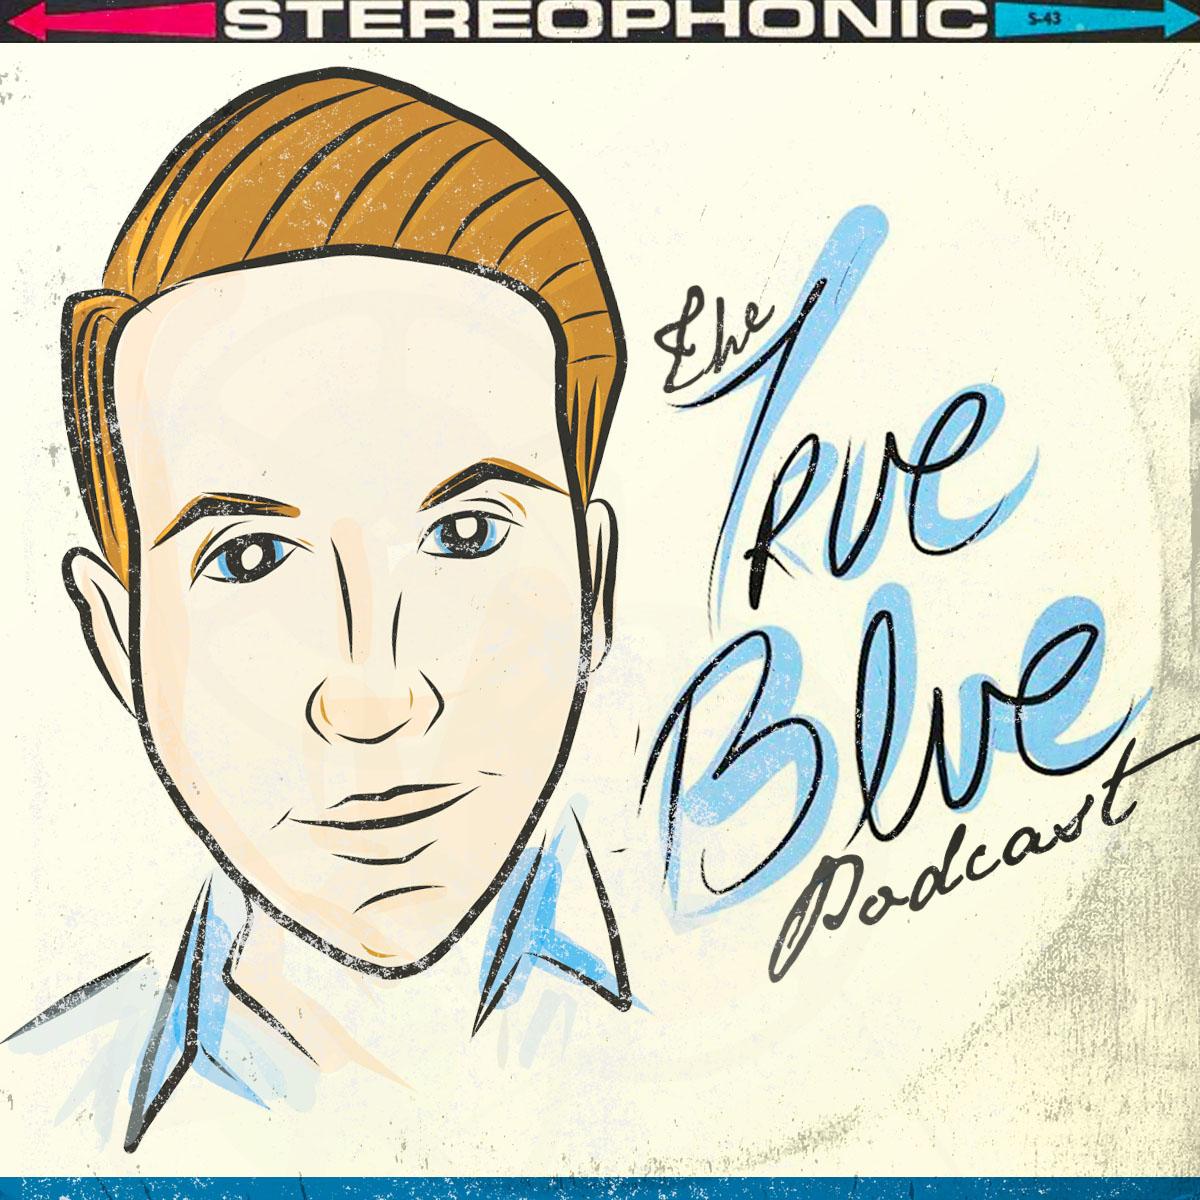 benny blue podcast cover.jpg